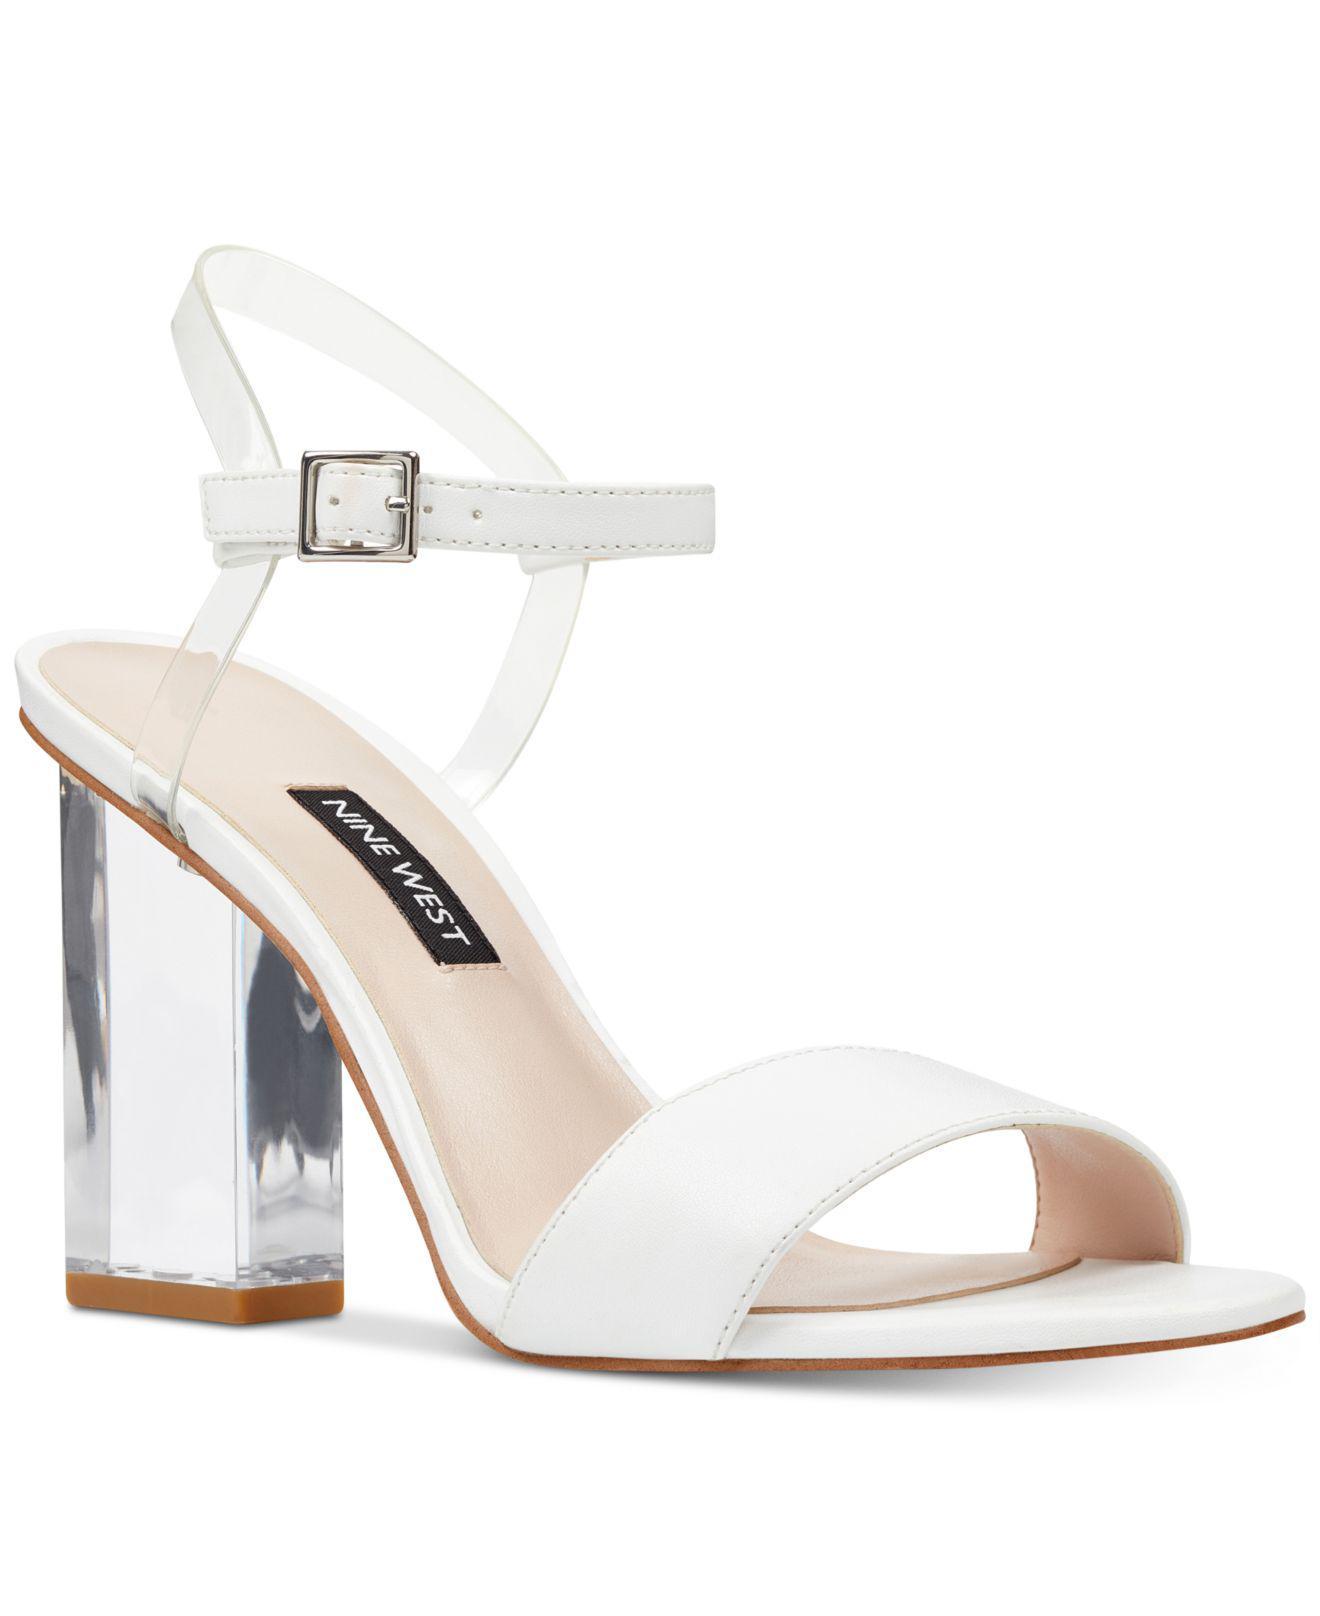 Nine West Fiesty City Sandals Women's Shoes Dpb8Ss1